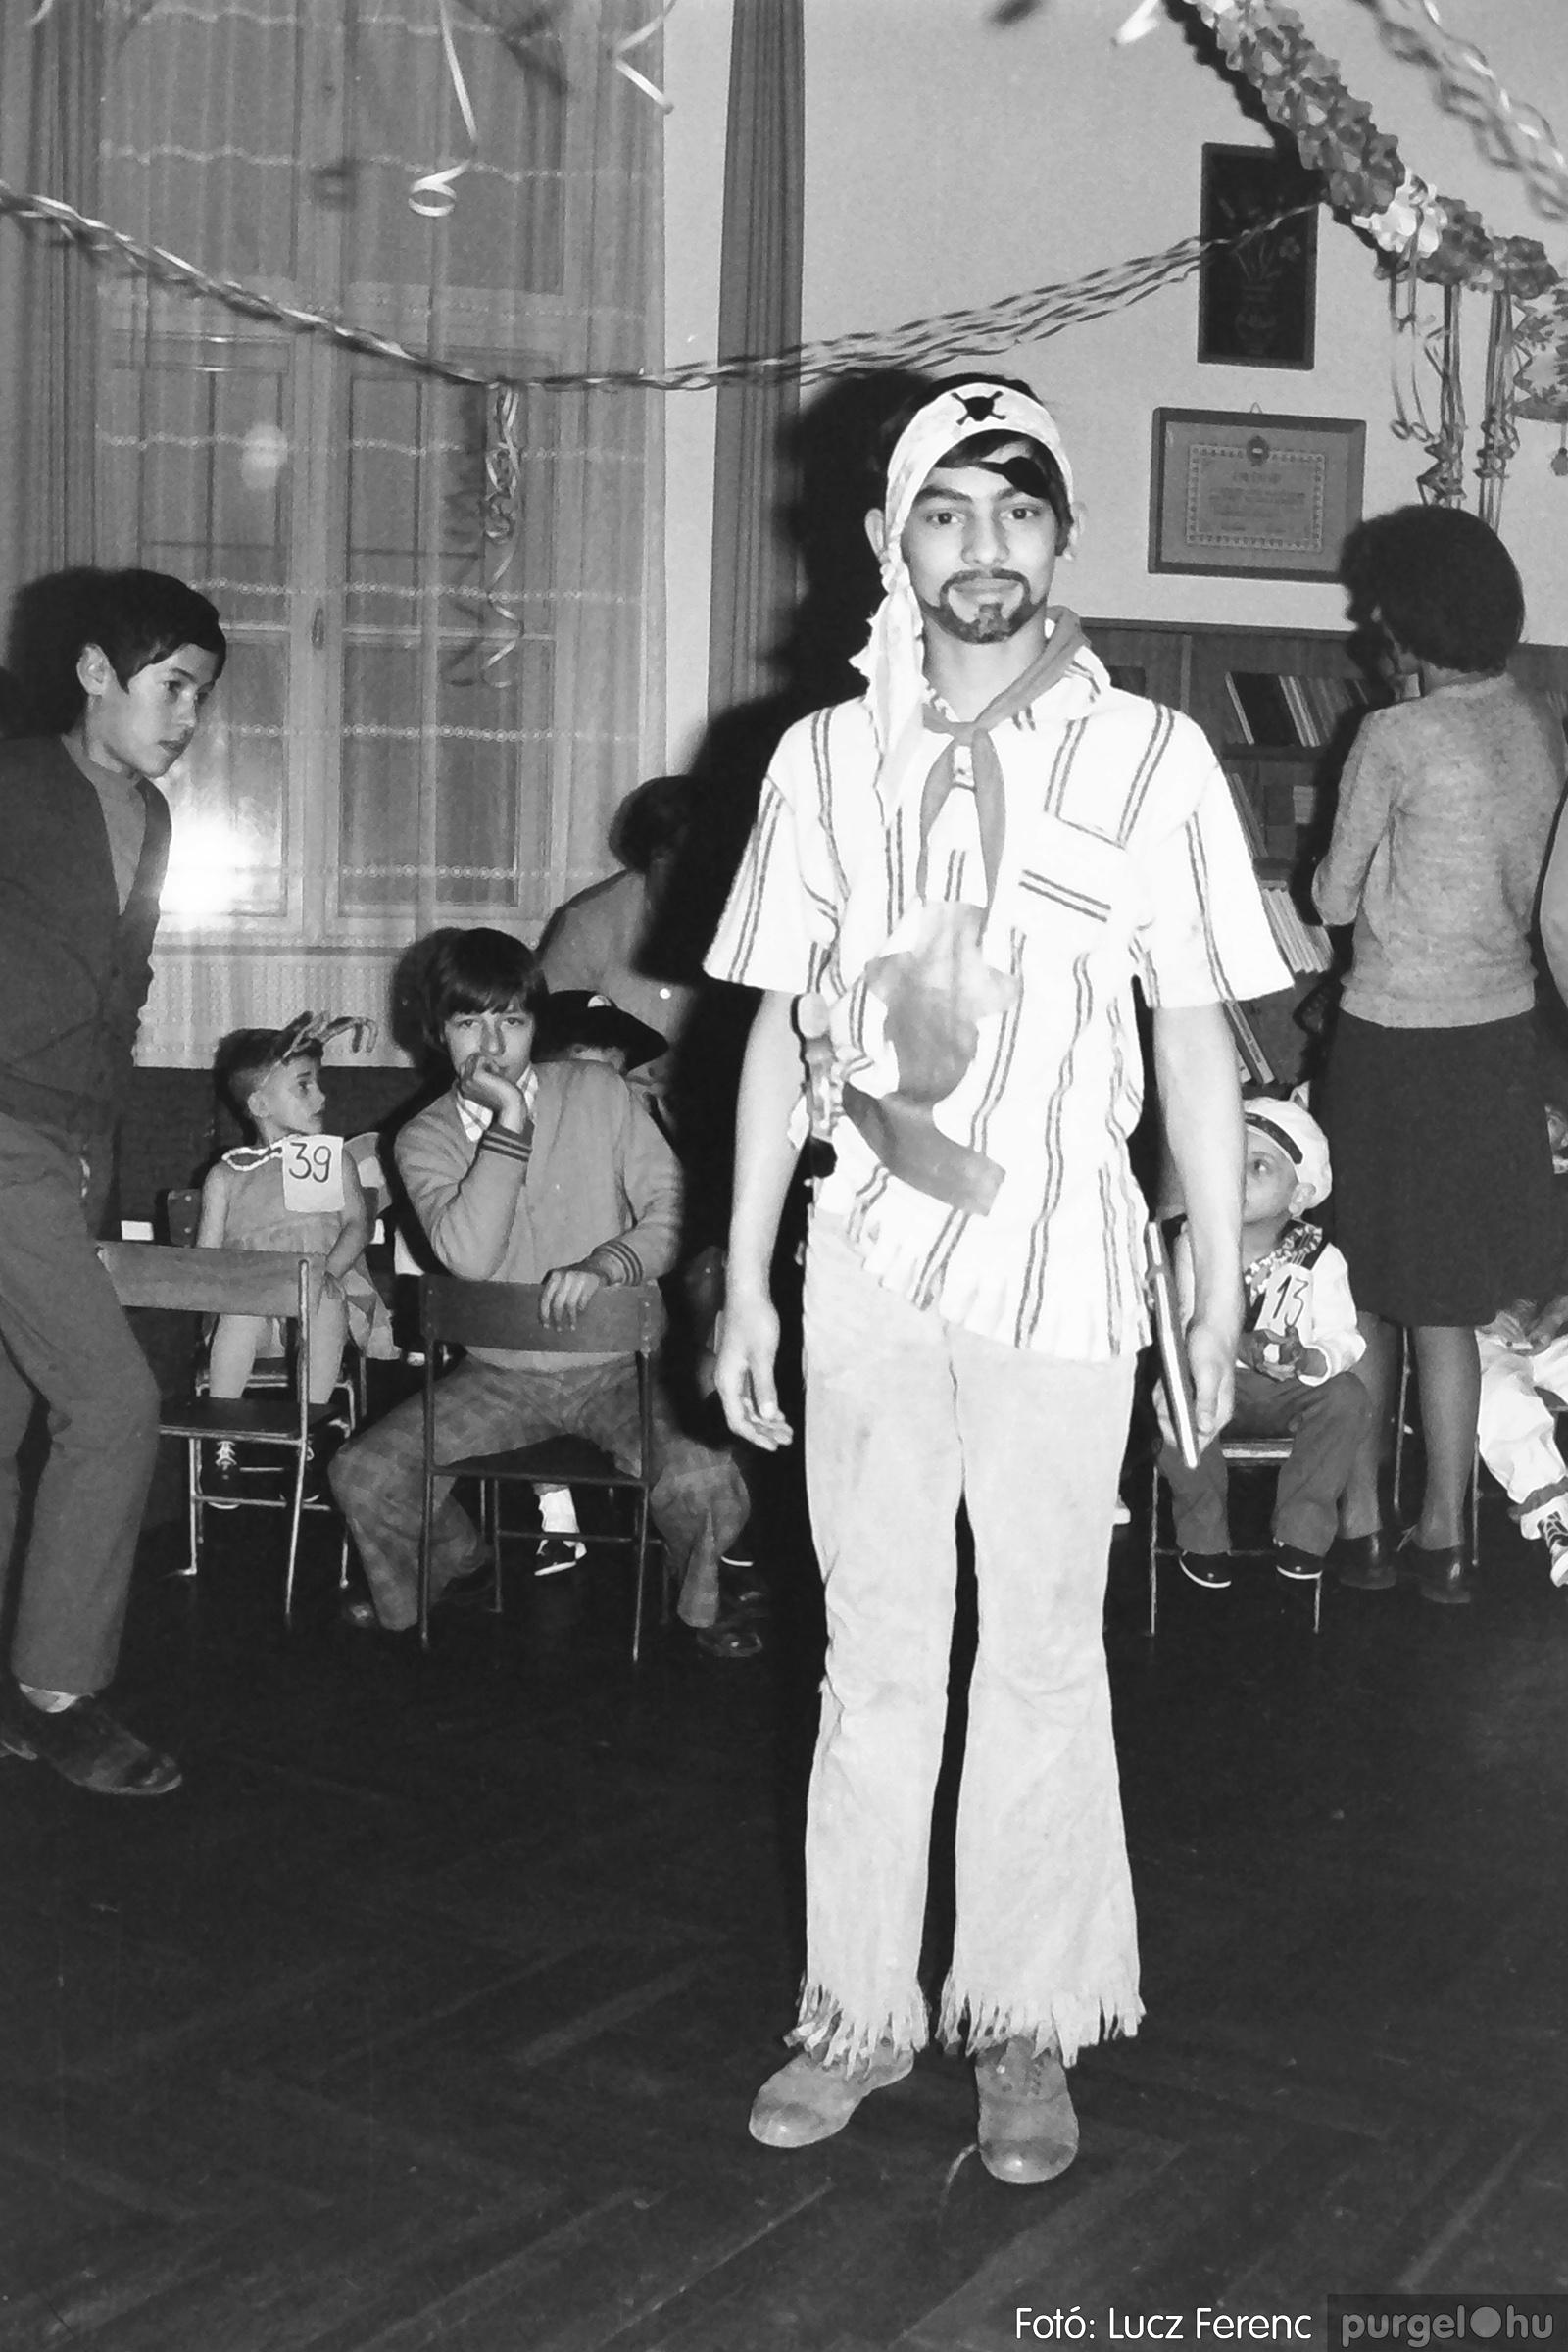 074. 1977. Farsang a gyermekotthonban 011. - Fotó: Lucz Ferenc.jpg